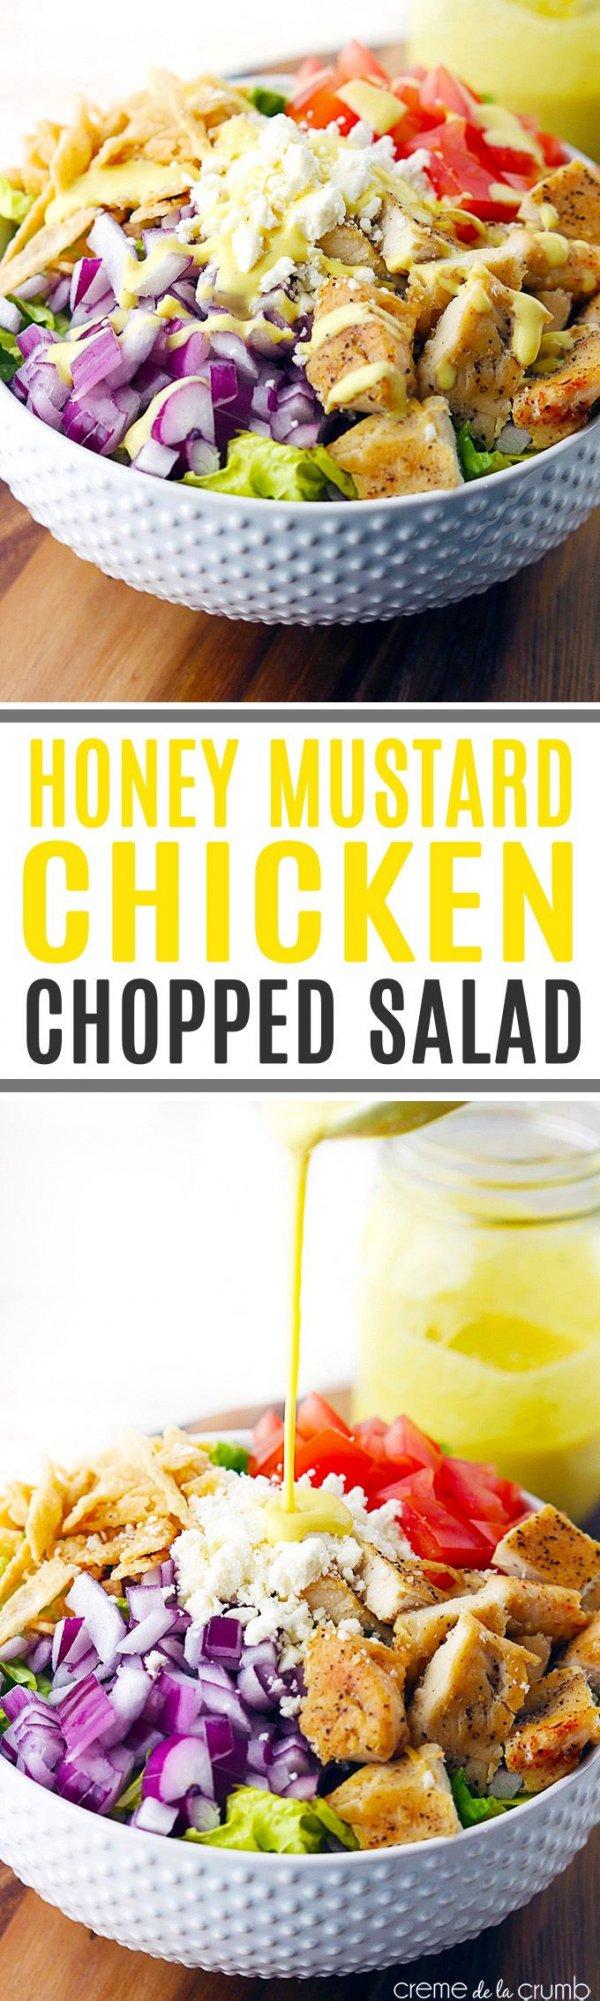 Seasoned Chicken, Feta Cheese, & Crispy Wonton Strips